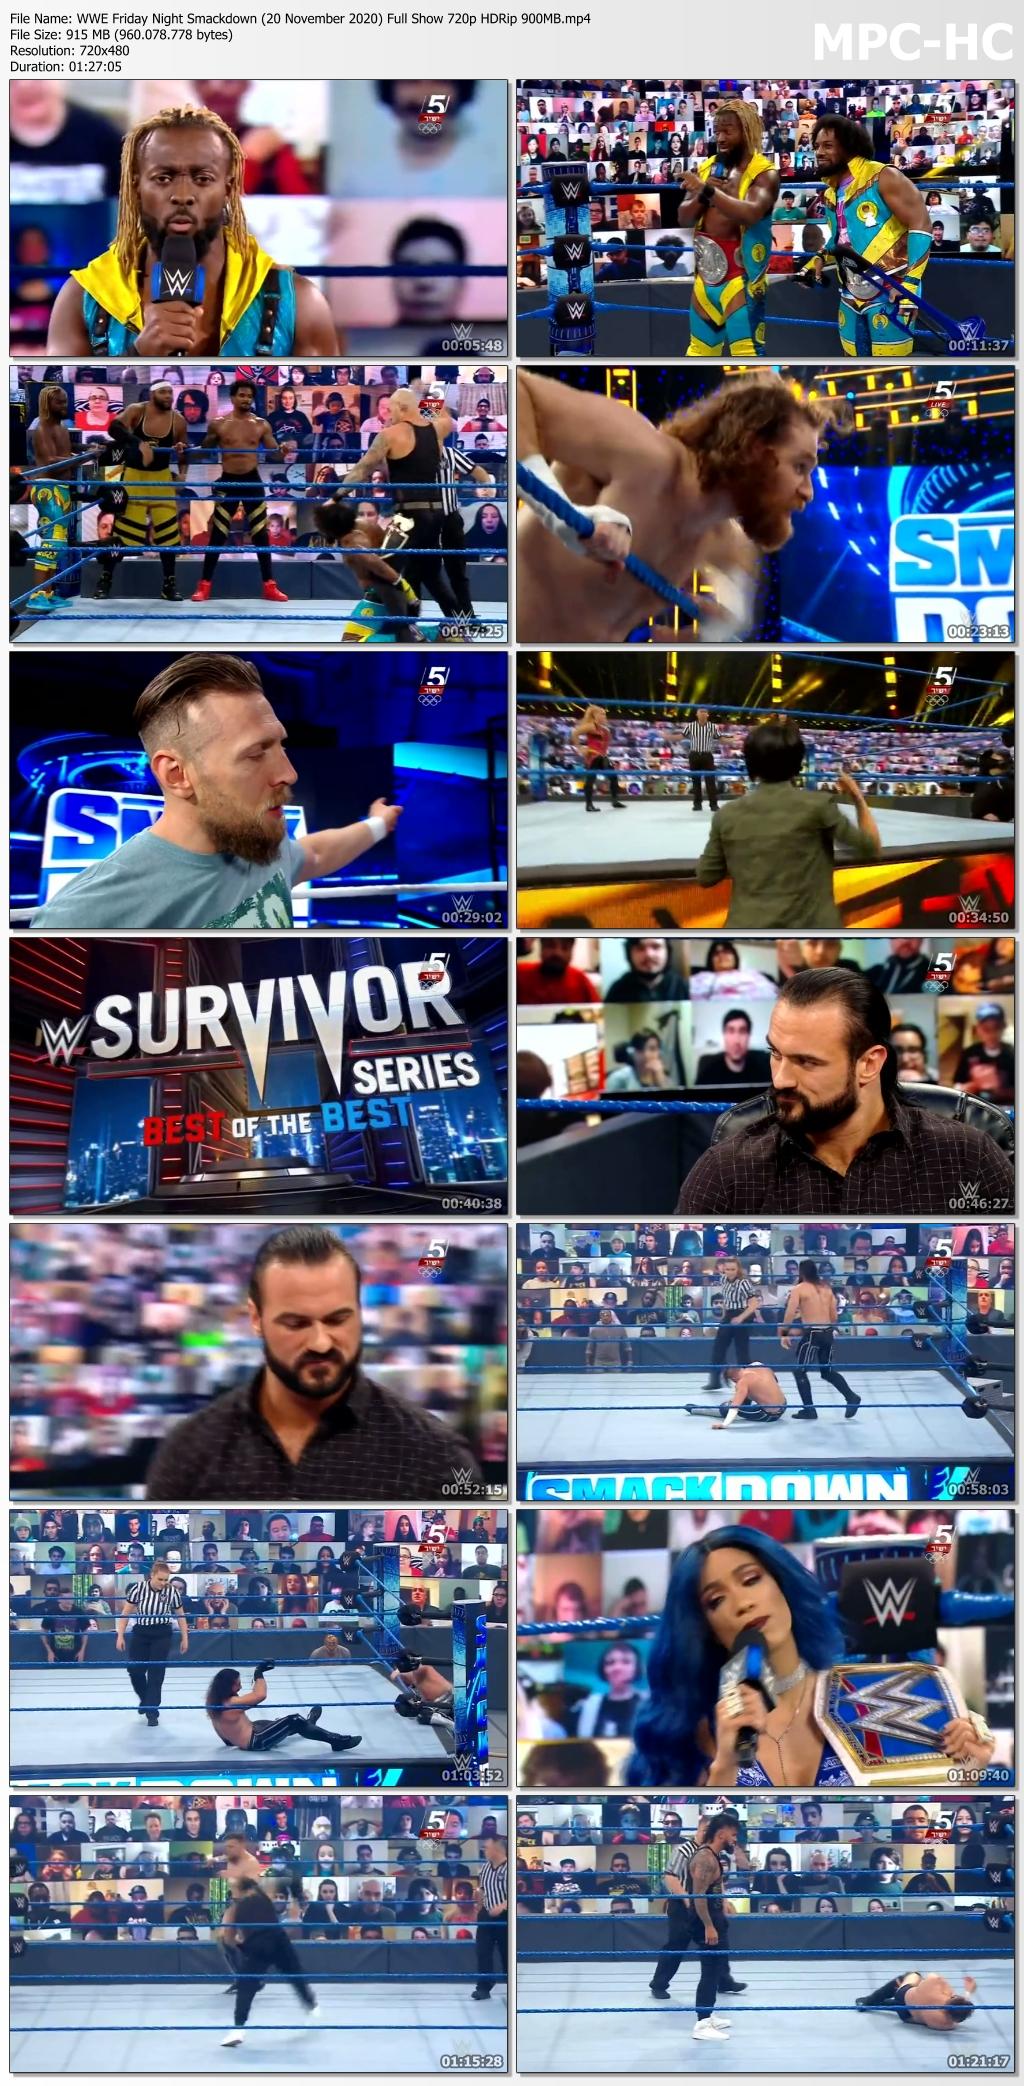 WWE-Friday-Night-Smackdown-20-November-2020-Full-Show-720p-HDRip-900-MB-mp4-thumbs